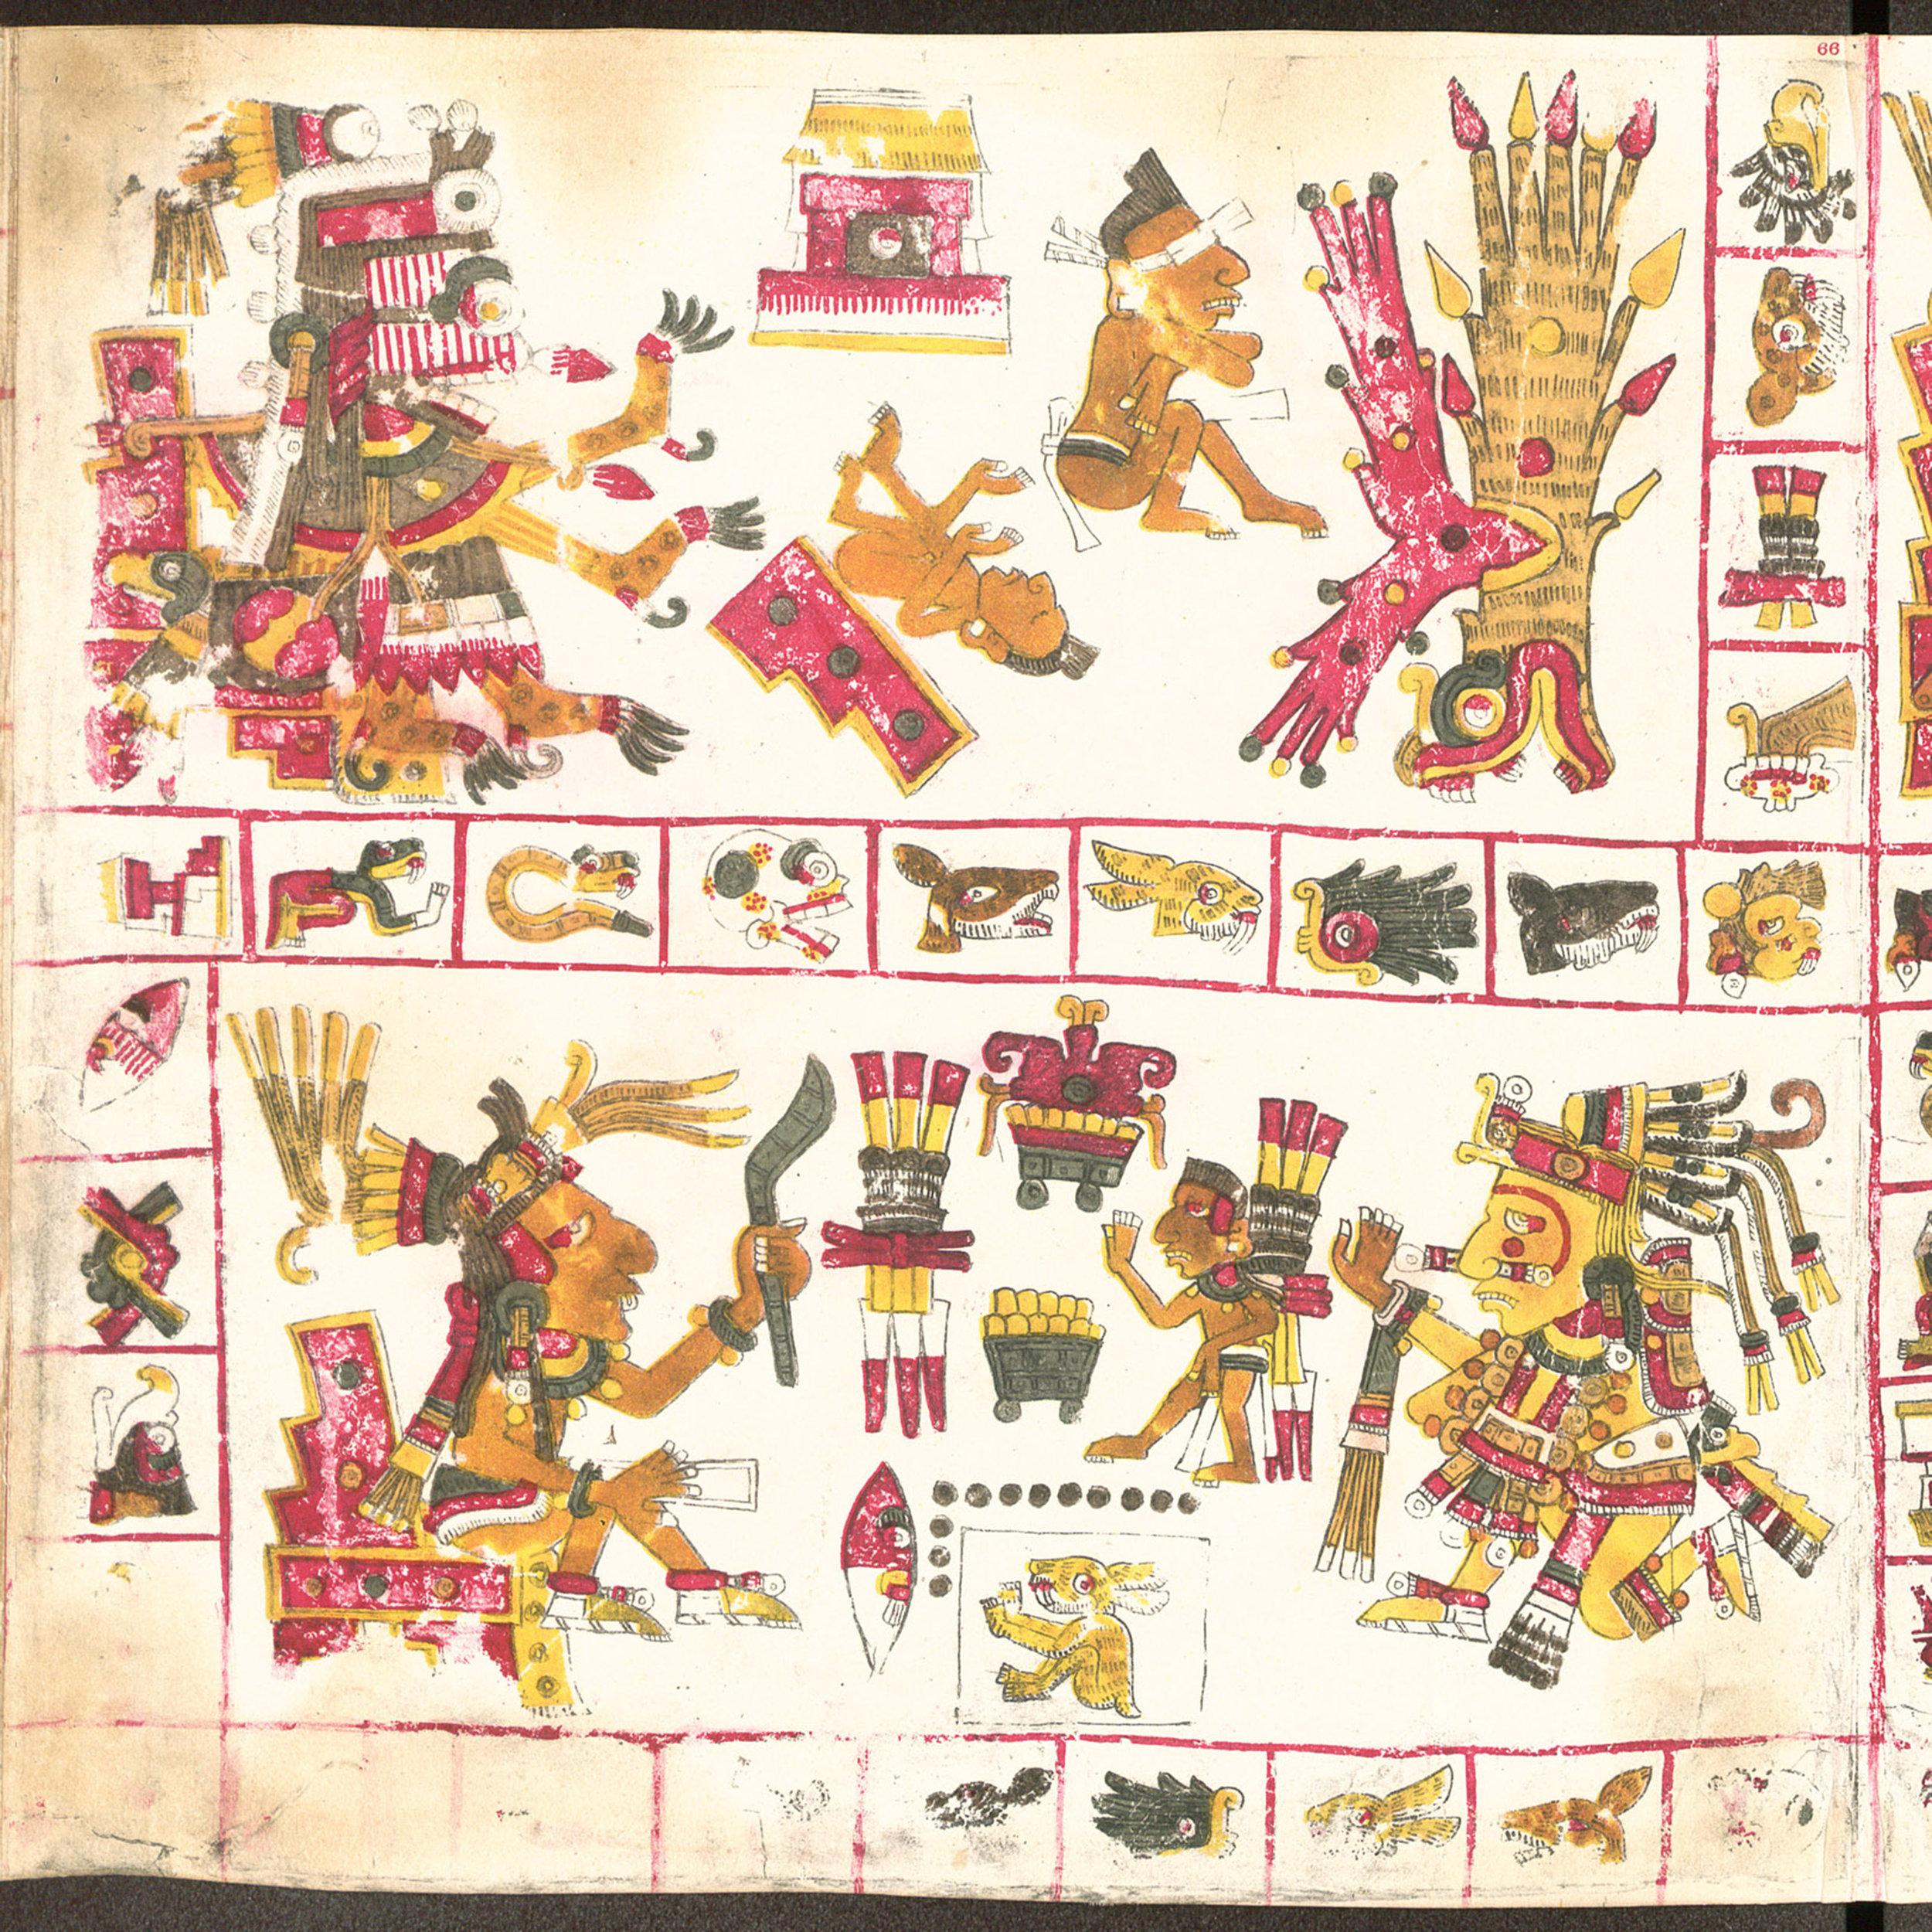 03_Codex_Borgia_pag_66.jpg